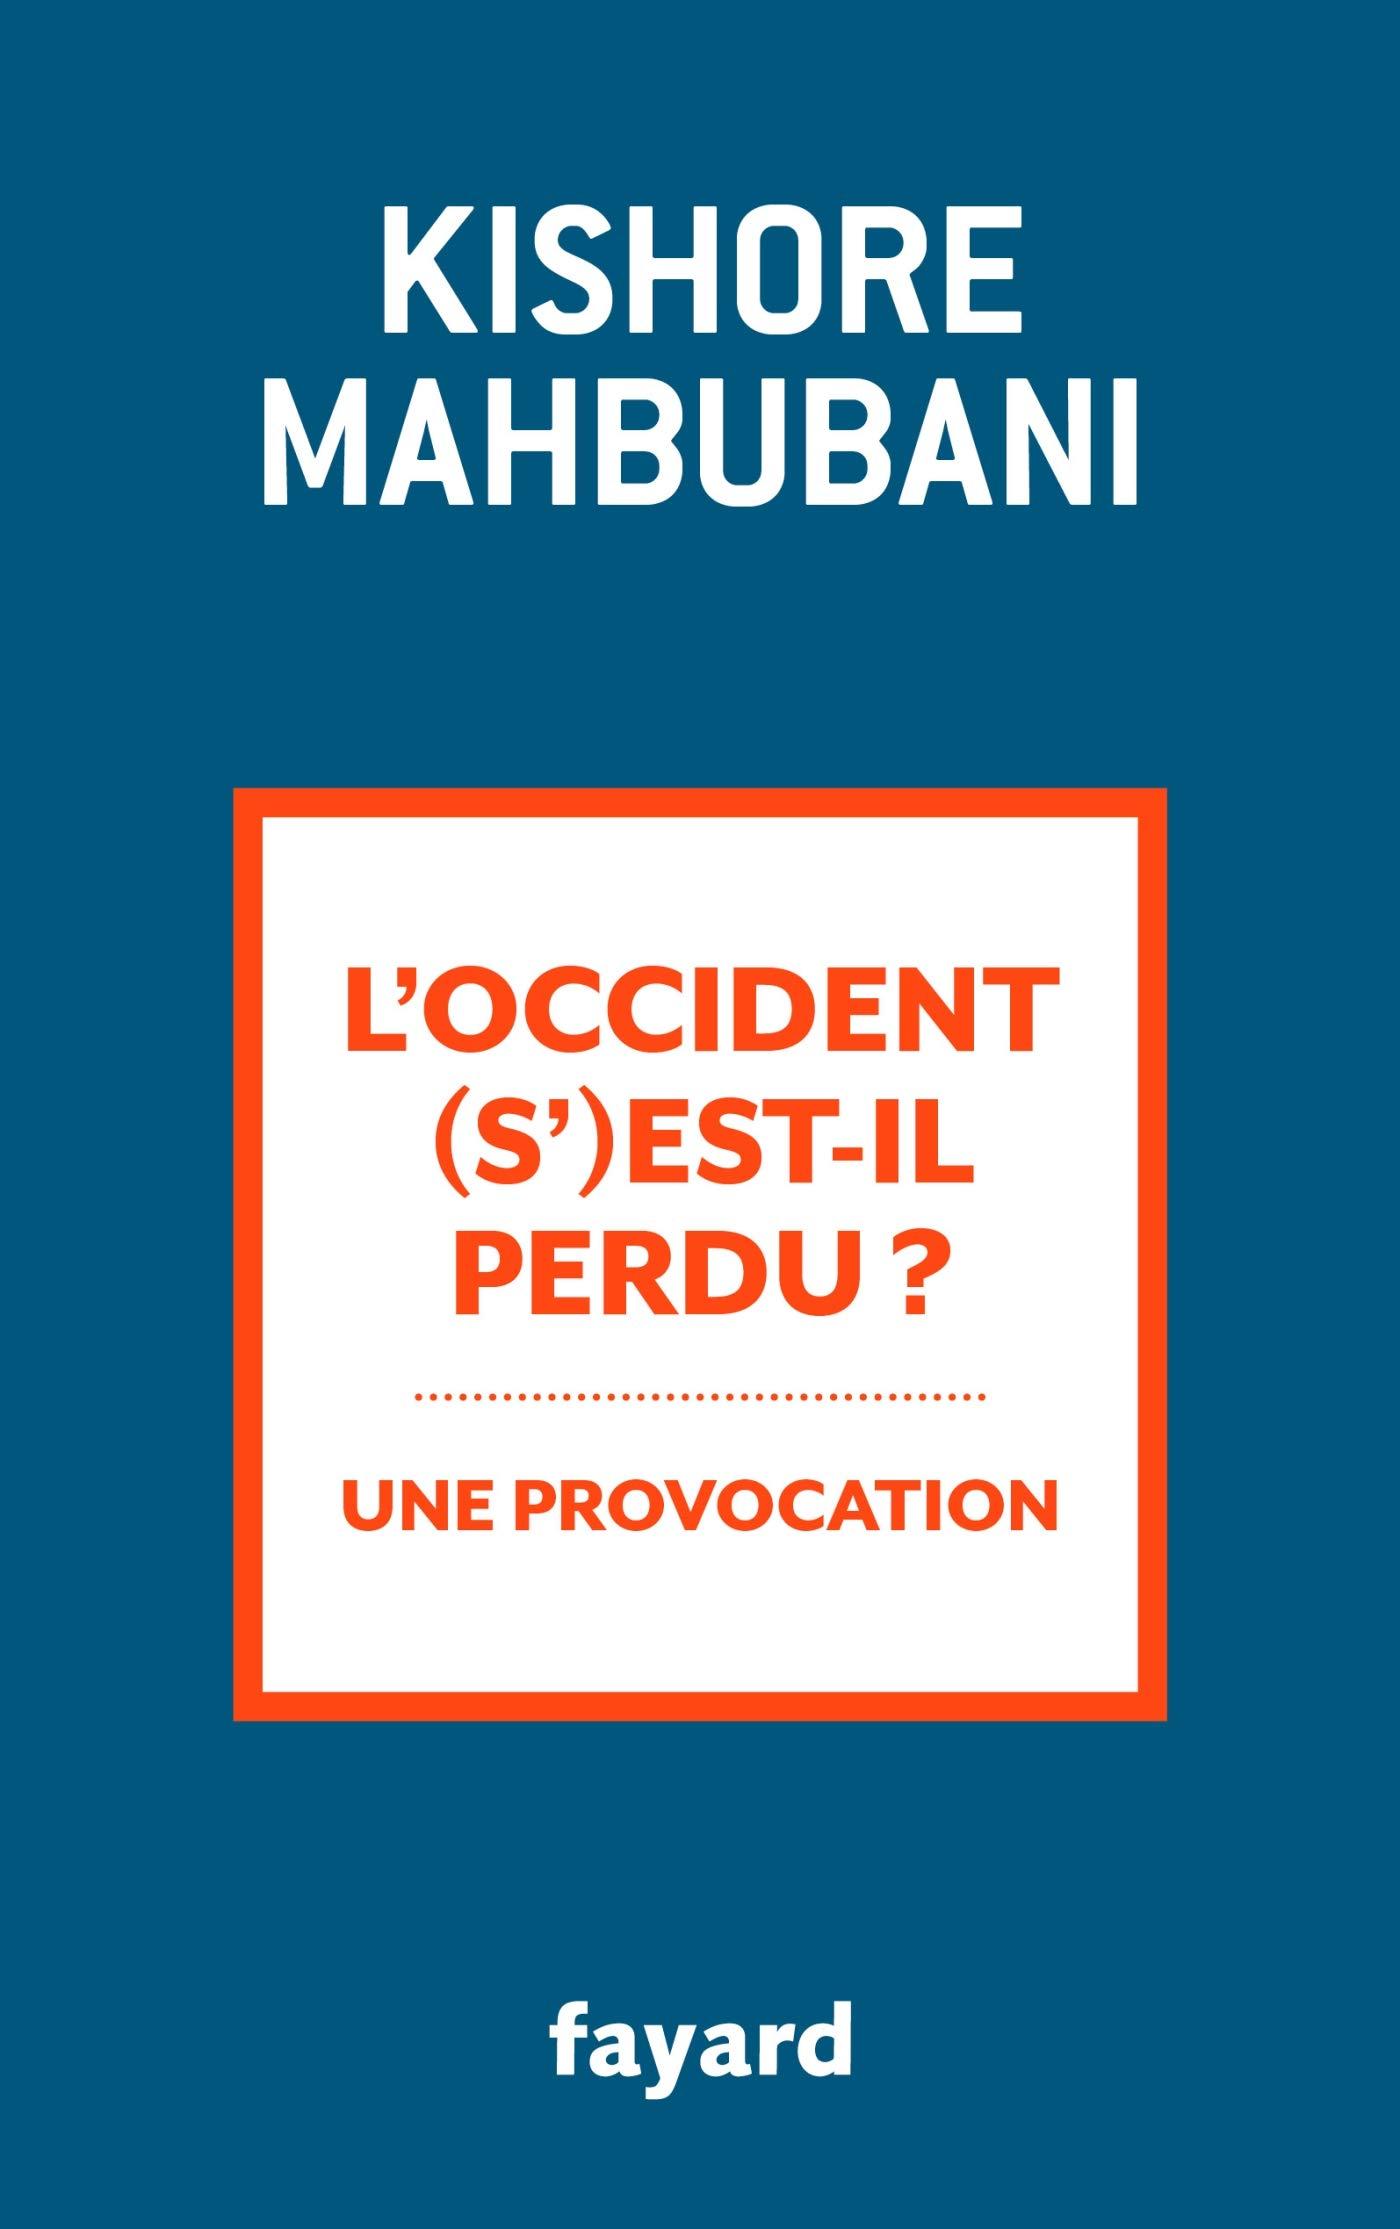 Amazonfr Loccident Sest Il Perdu Kishore Mahbubani